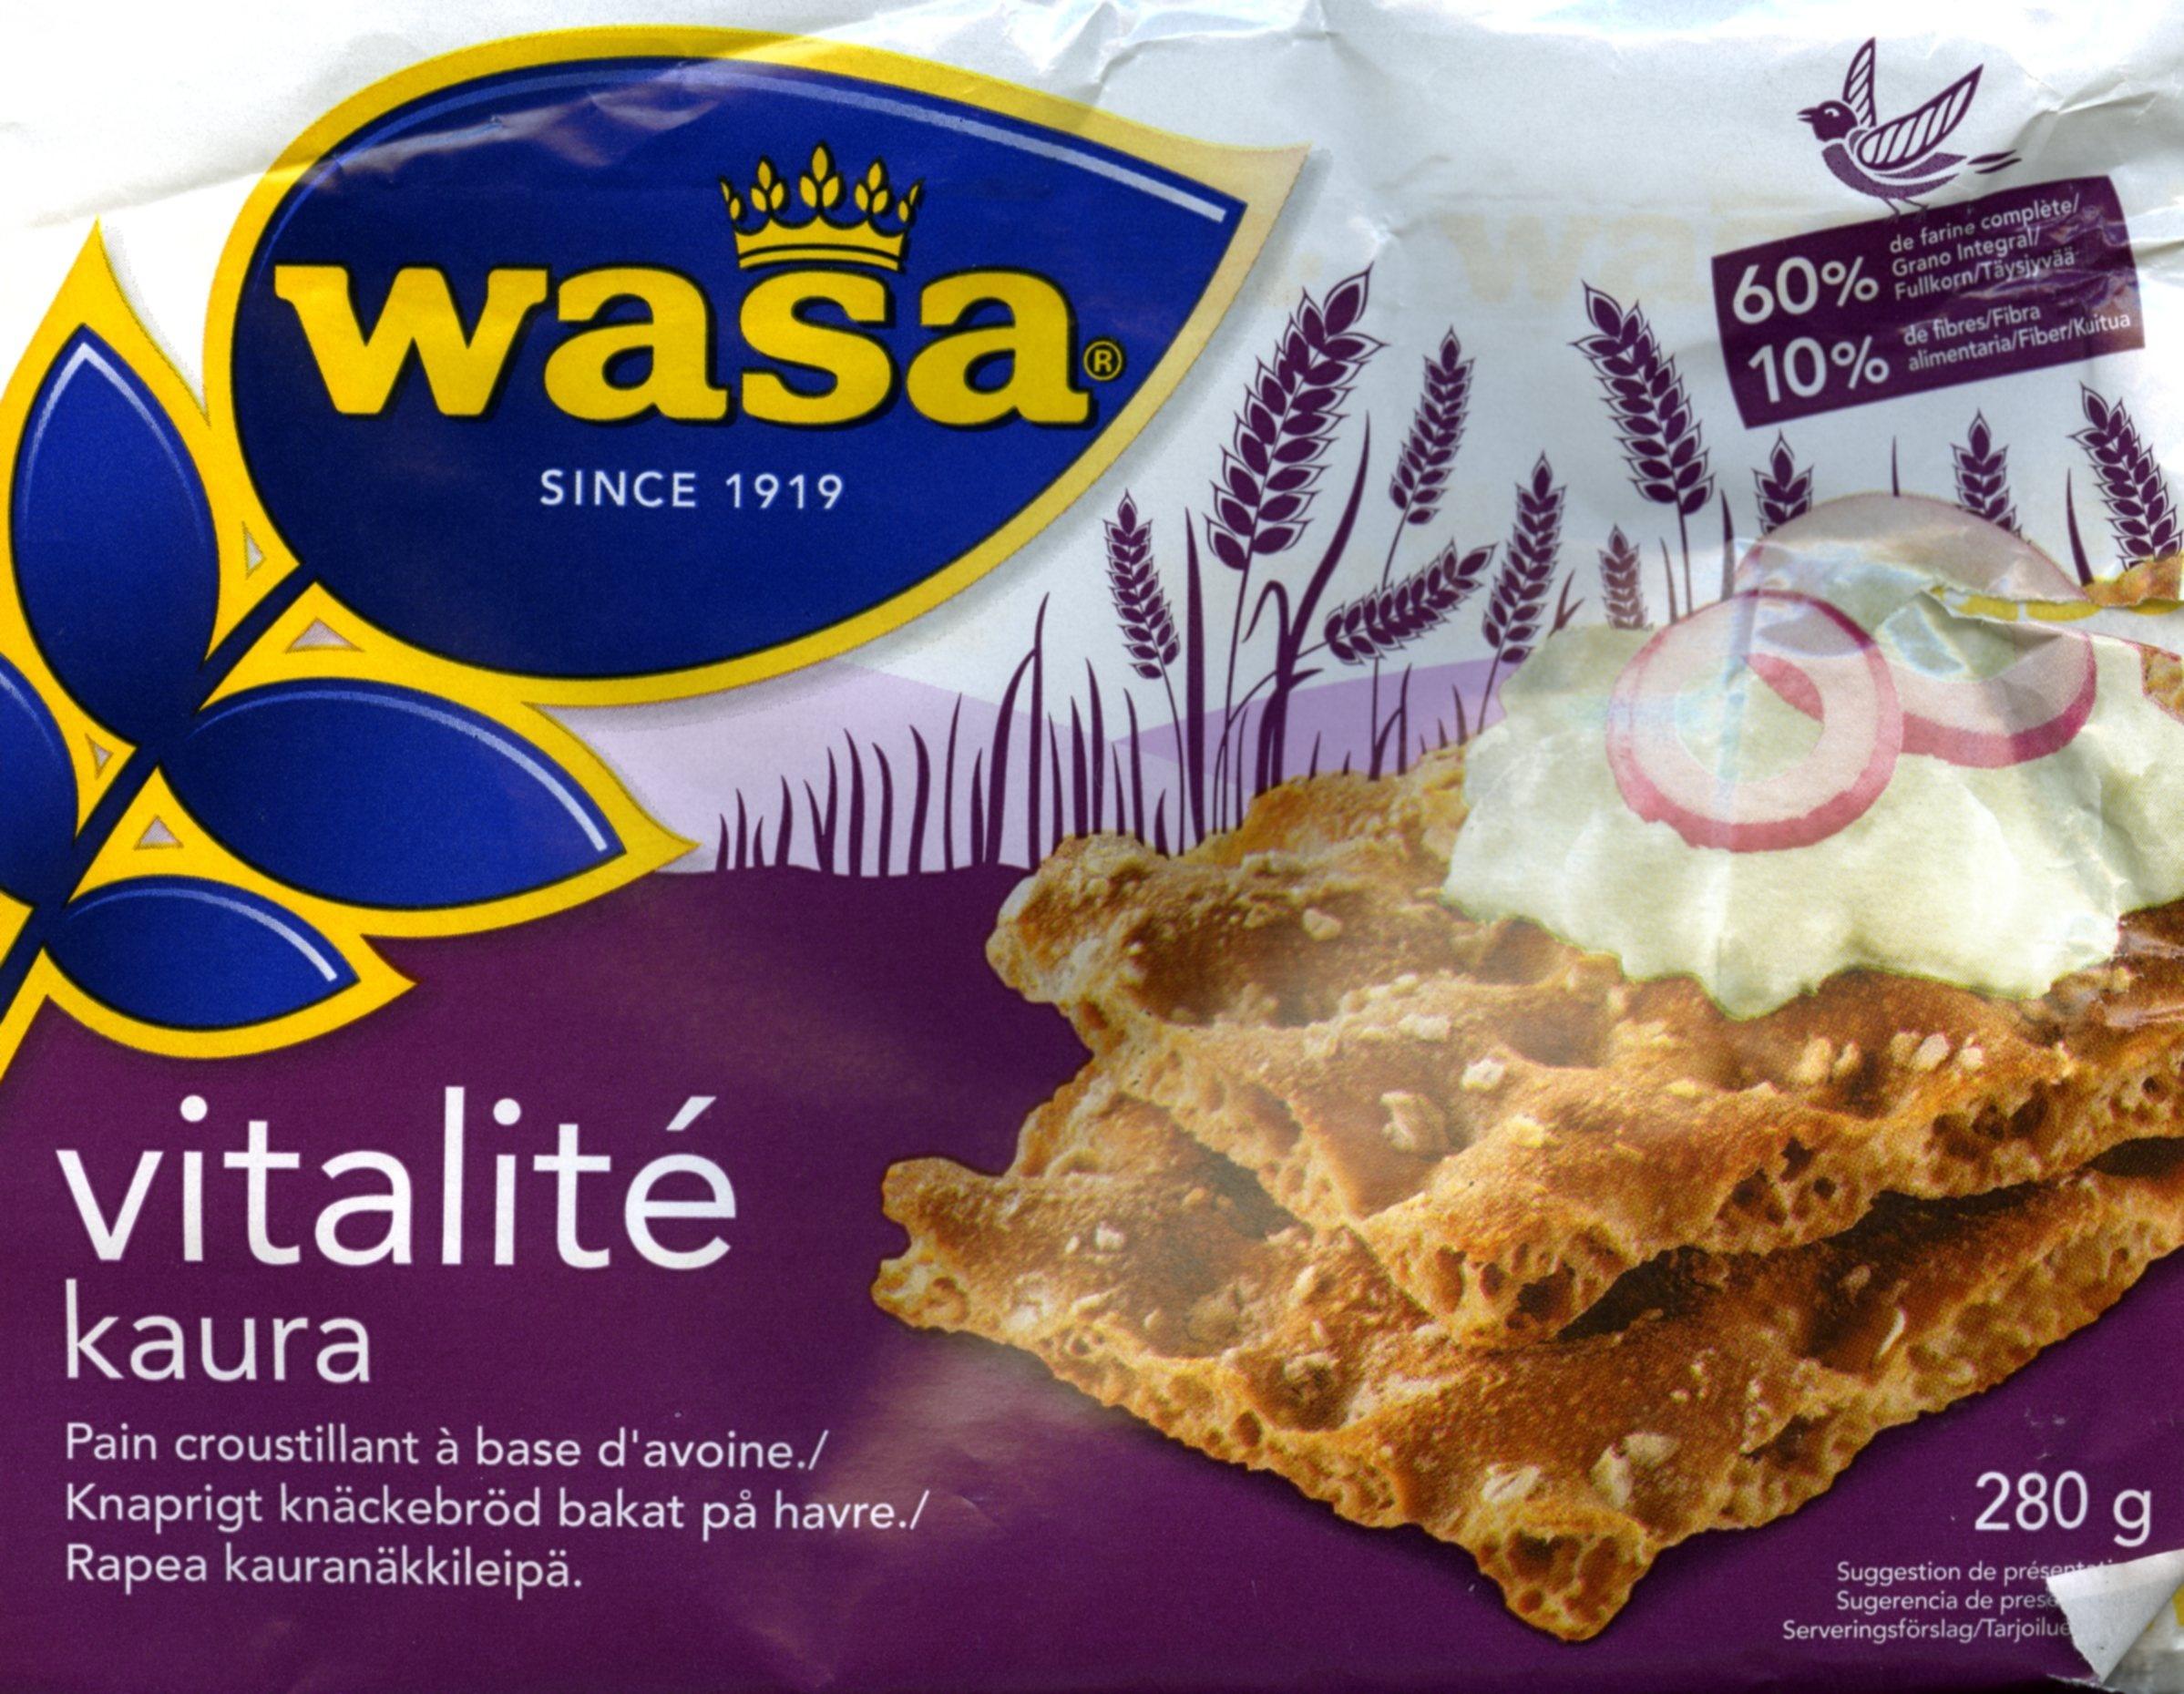 Biscotes integrales con avena - Product